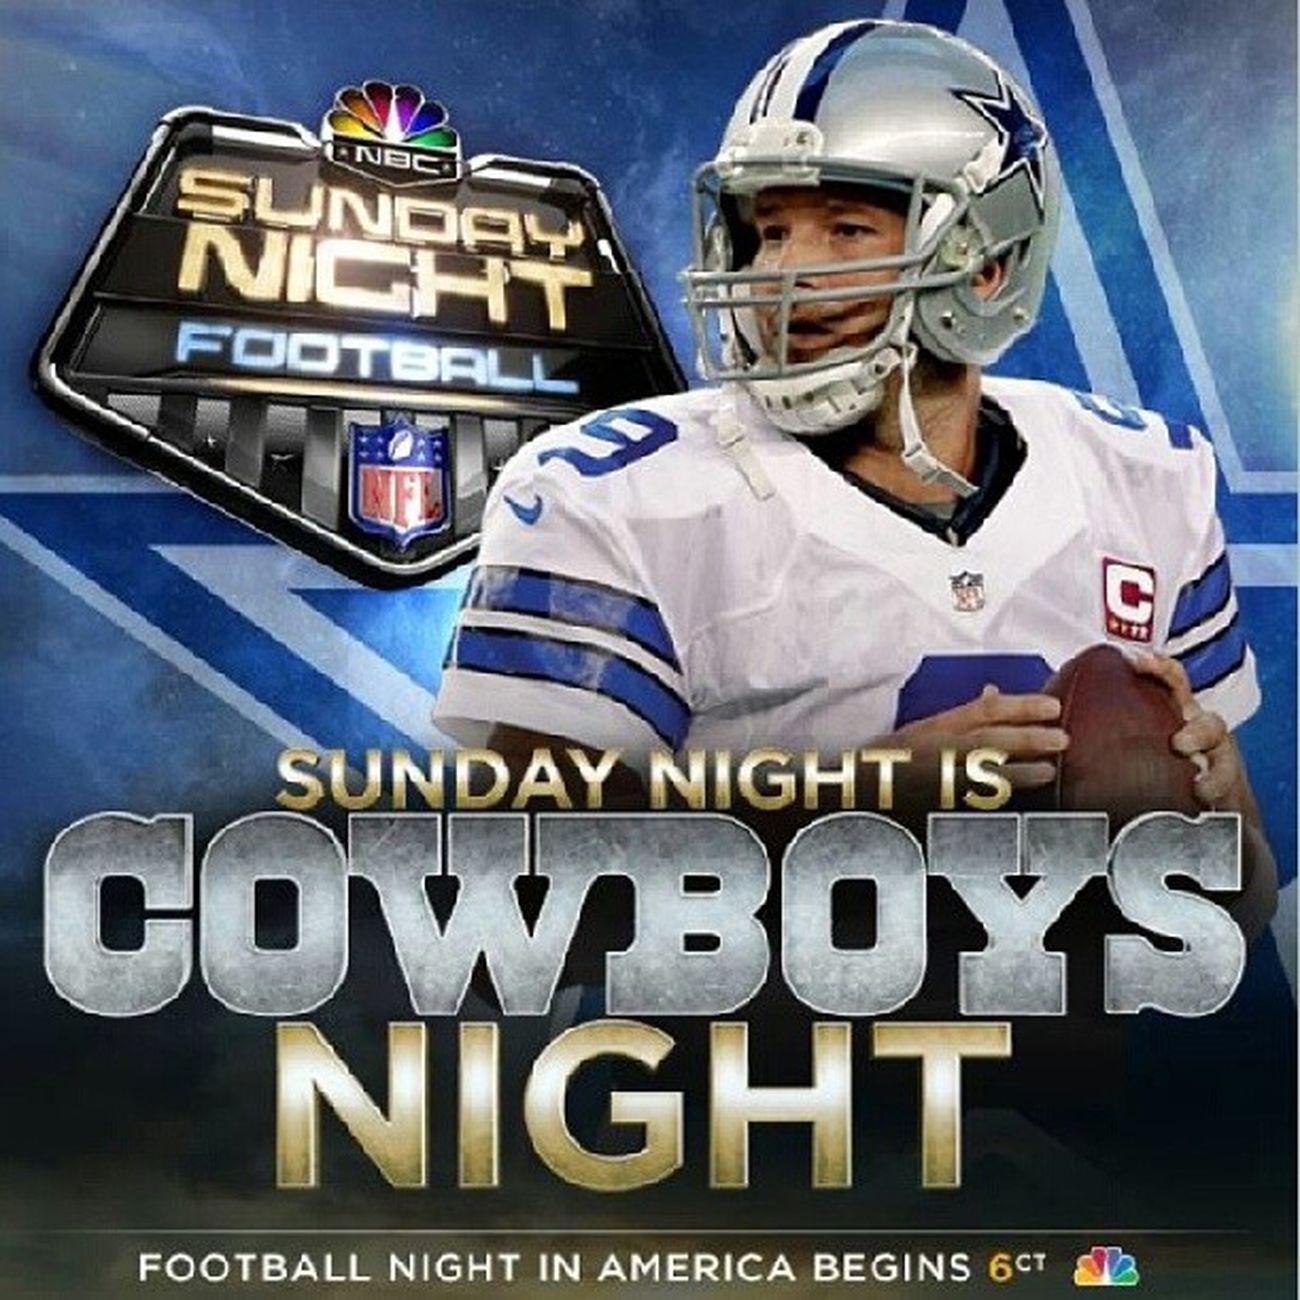 Its almost GAME TIME!!!!!!!!! SlayTheGiants HowBoutThemCowboys Dallascowboys DallasAllDay GoDallas Cowboys CowboysAllDay CowboysNation AmericasTeam SundayNightFootball